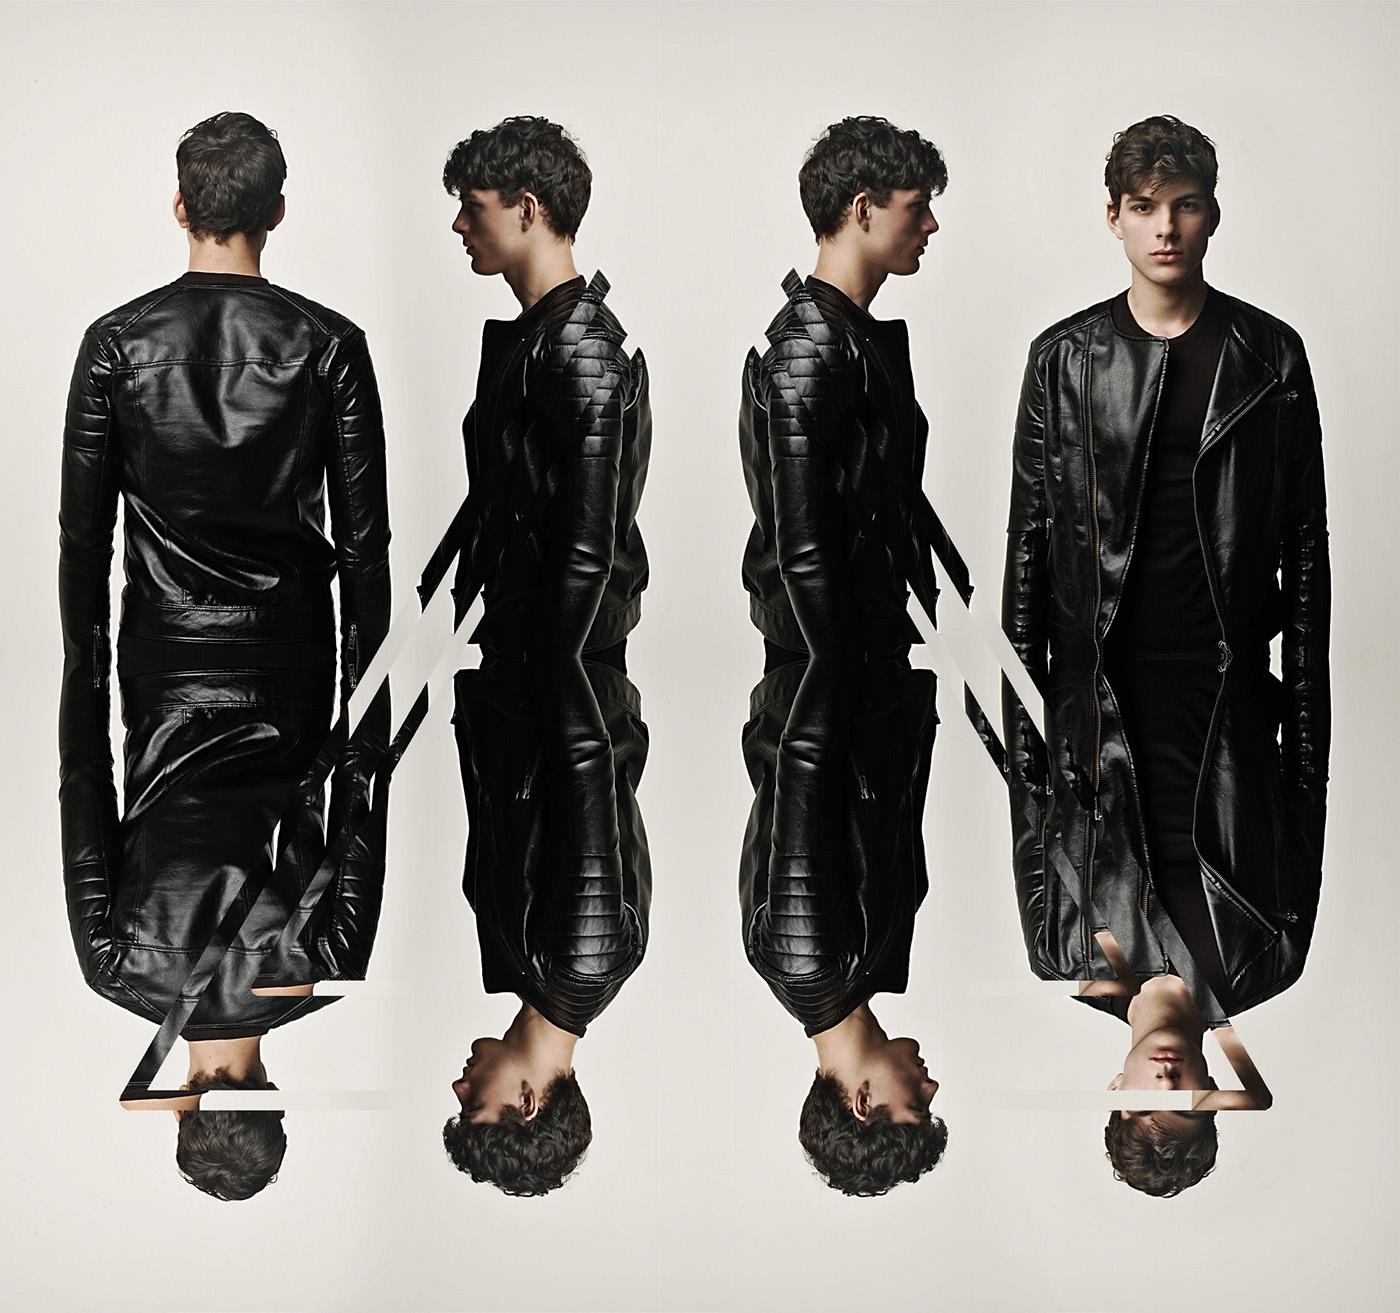 Leather jacket conditioner - Black Dress Leather Jacket Conditioner